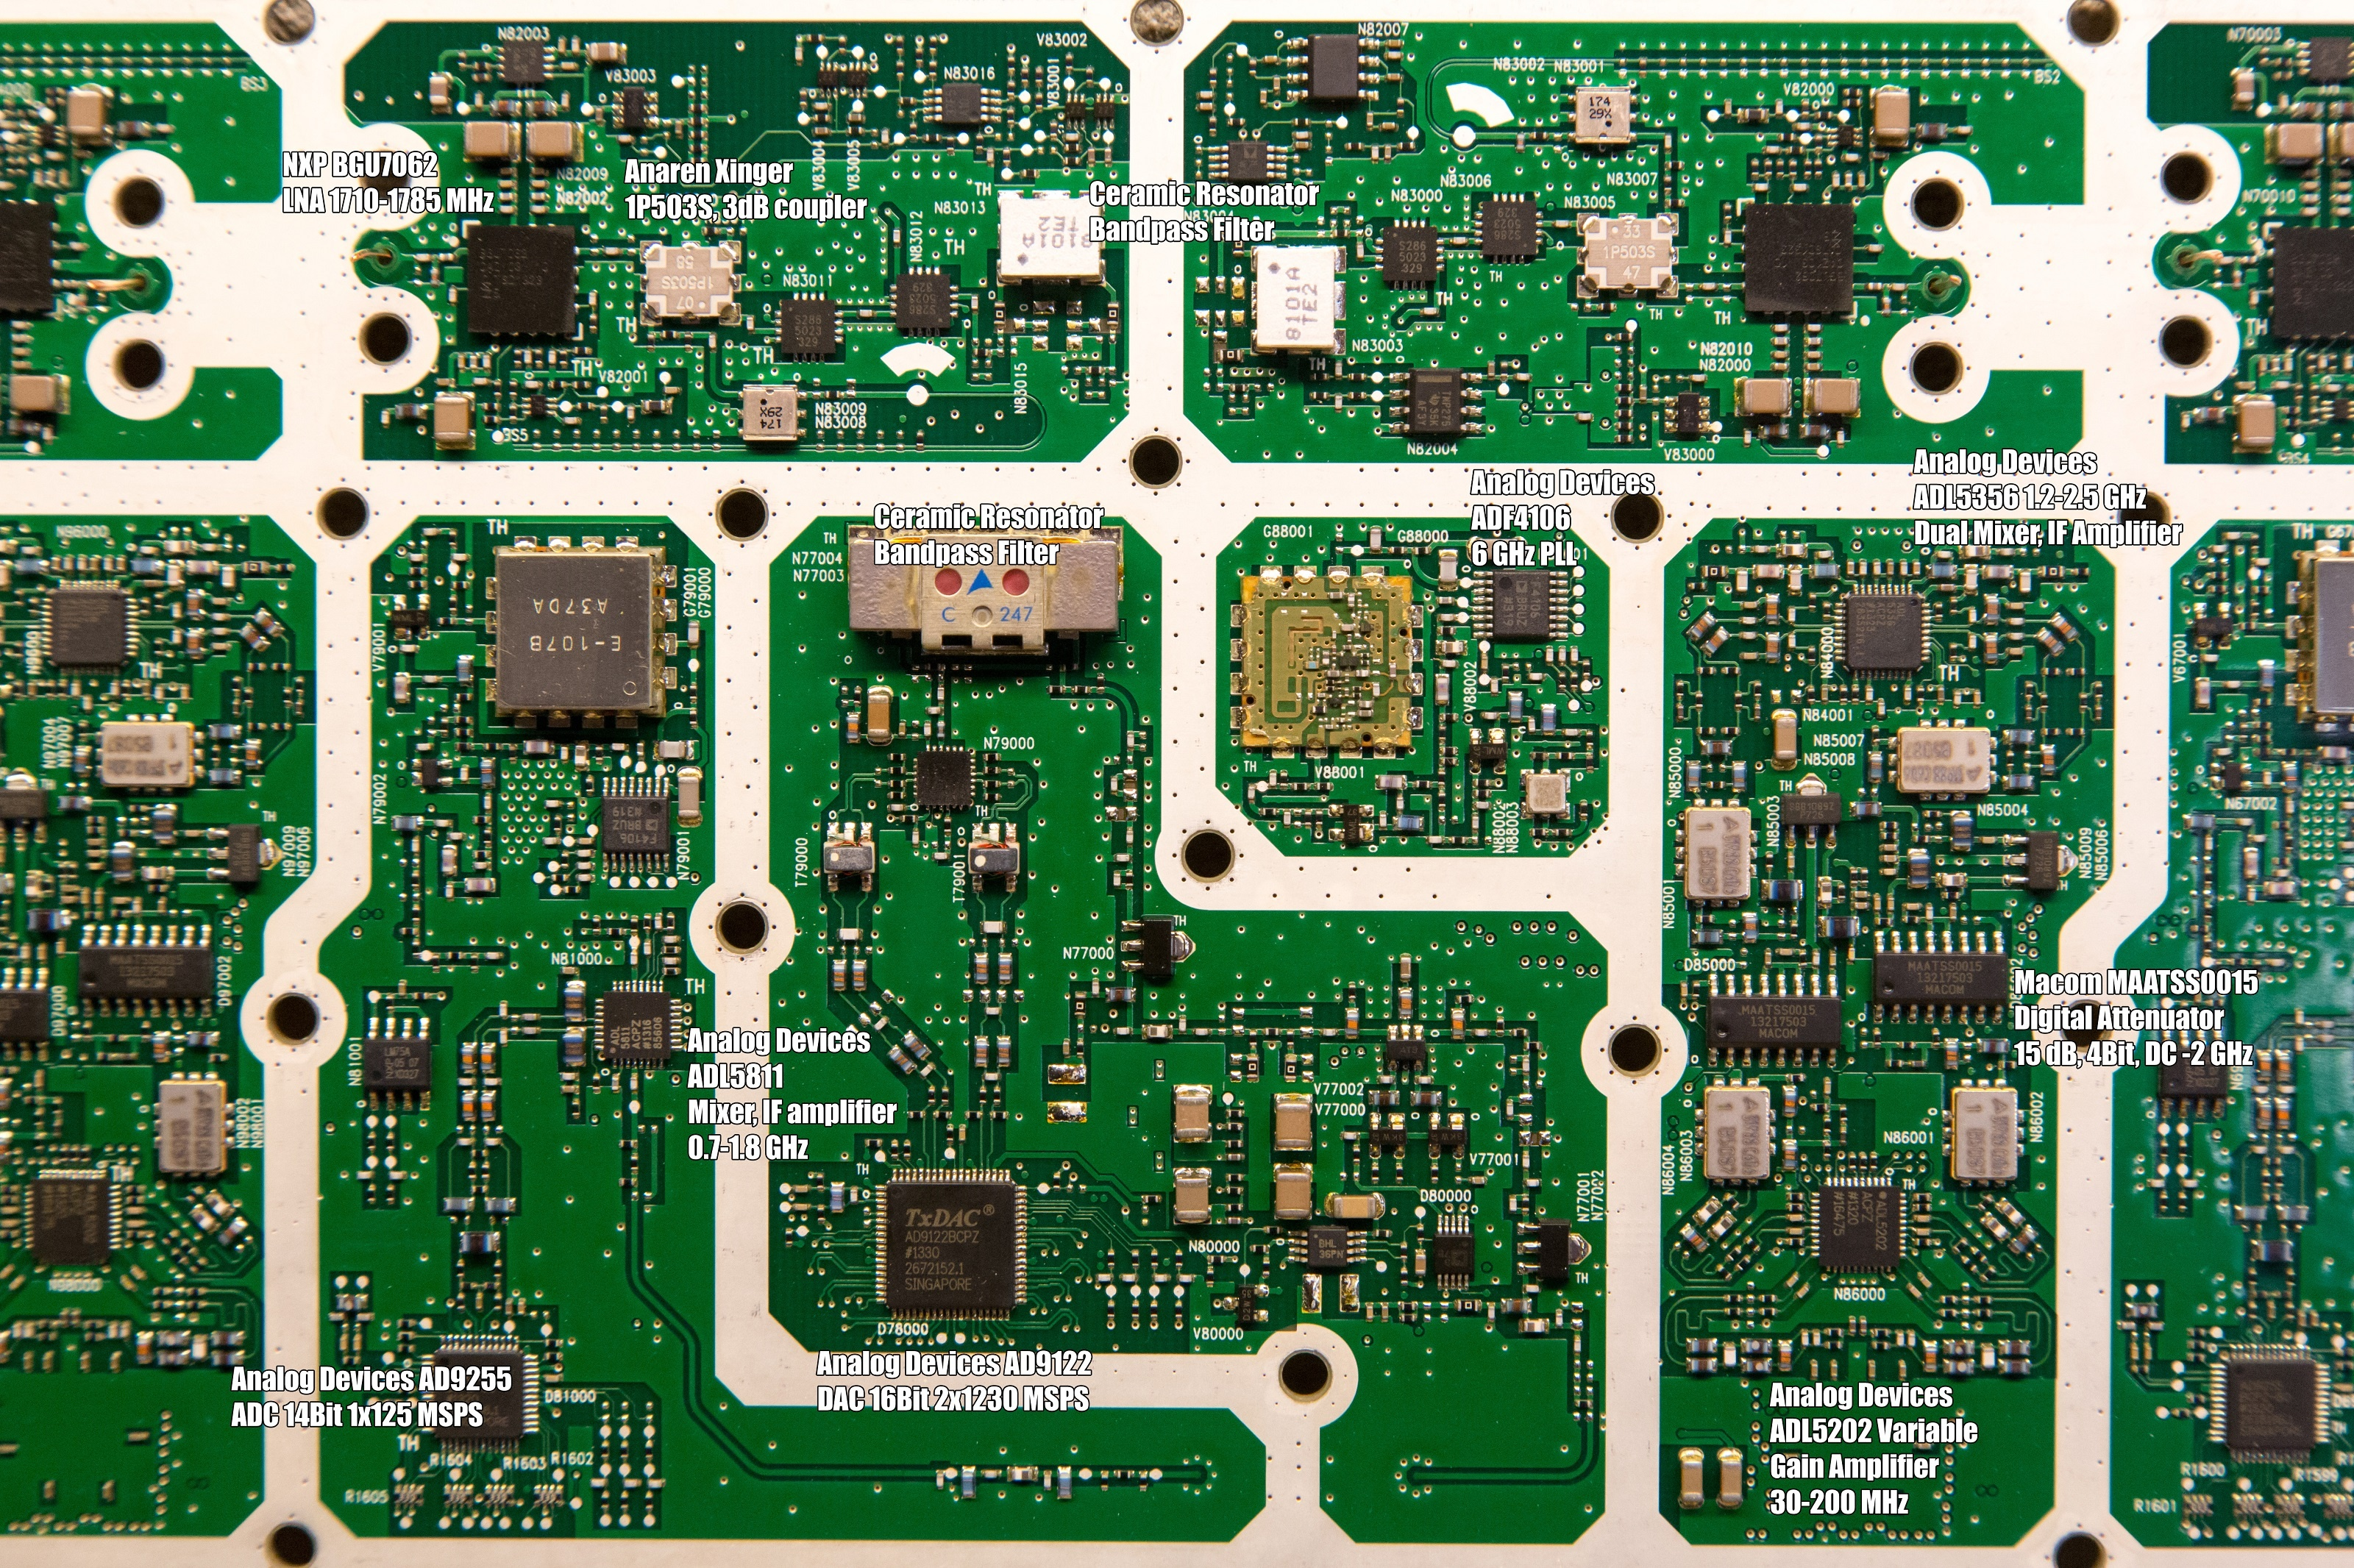 Nokia Siemens Networks Flexi FXEB base station amplifier